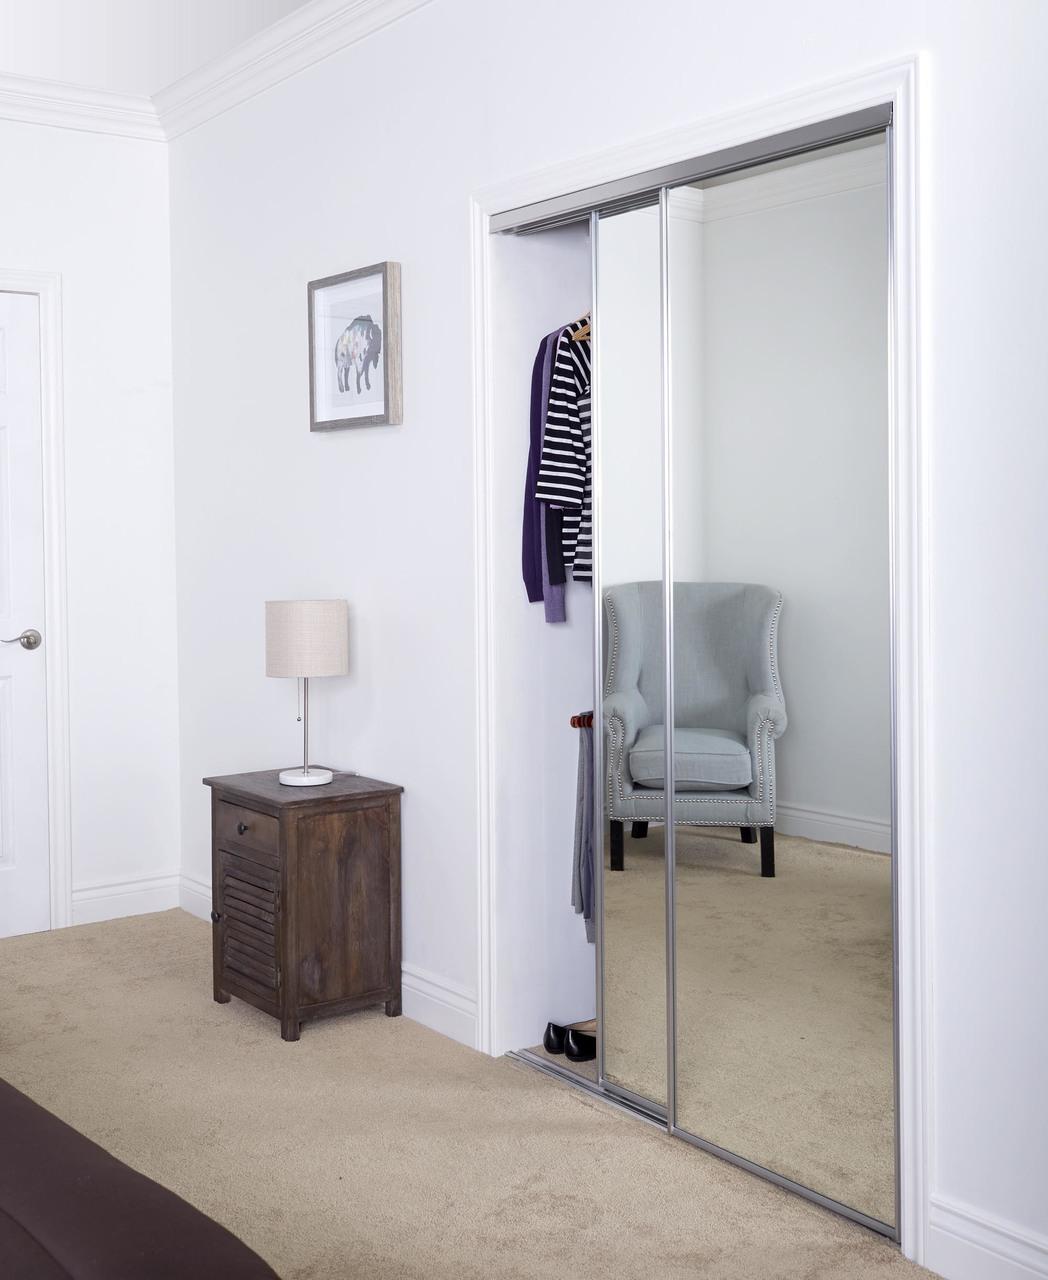 Aluminum Sliding Bypass Door With Mirror Insert Amp Narrow